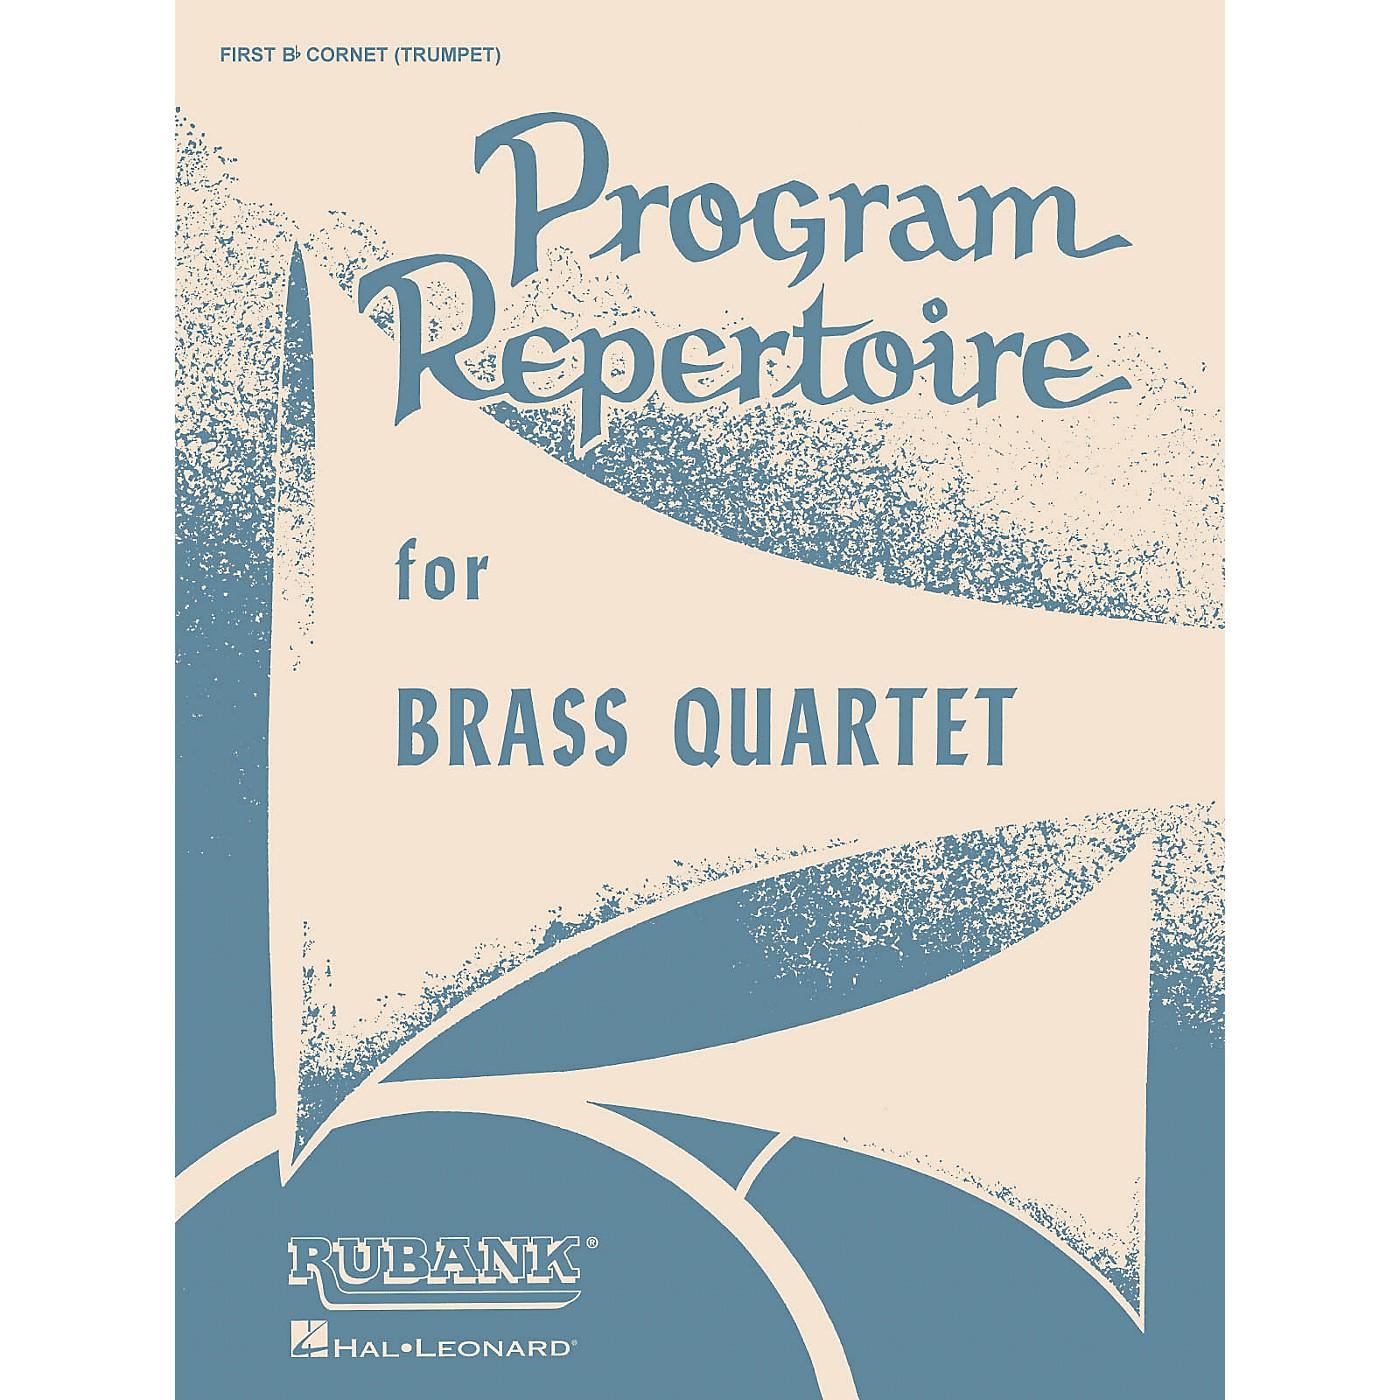 Rubank Publications Program Repertoire for Brass Quartet (1st B-flat Cornet/Trumpet) Ensemble Collection Series thumbnail